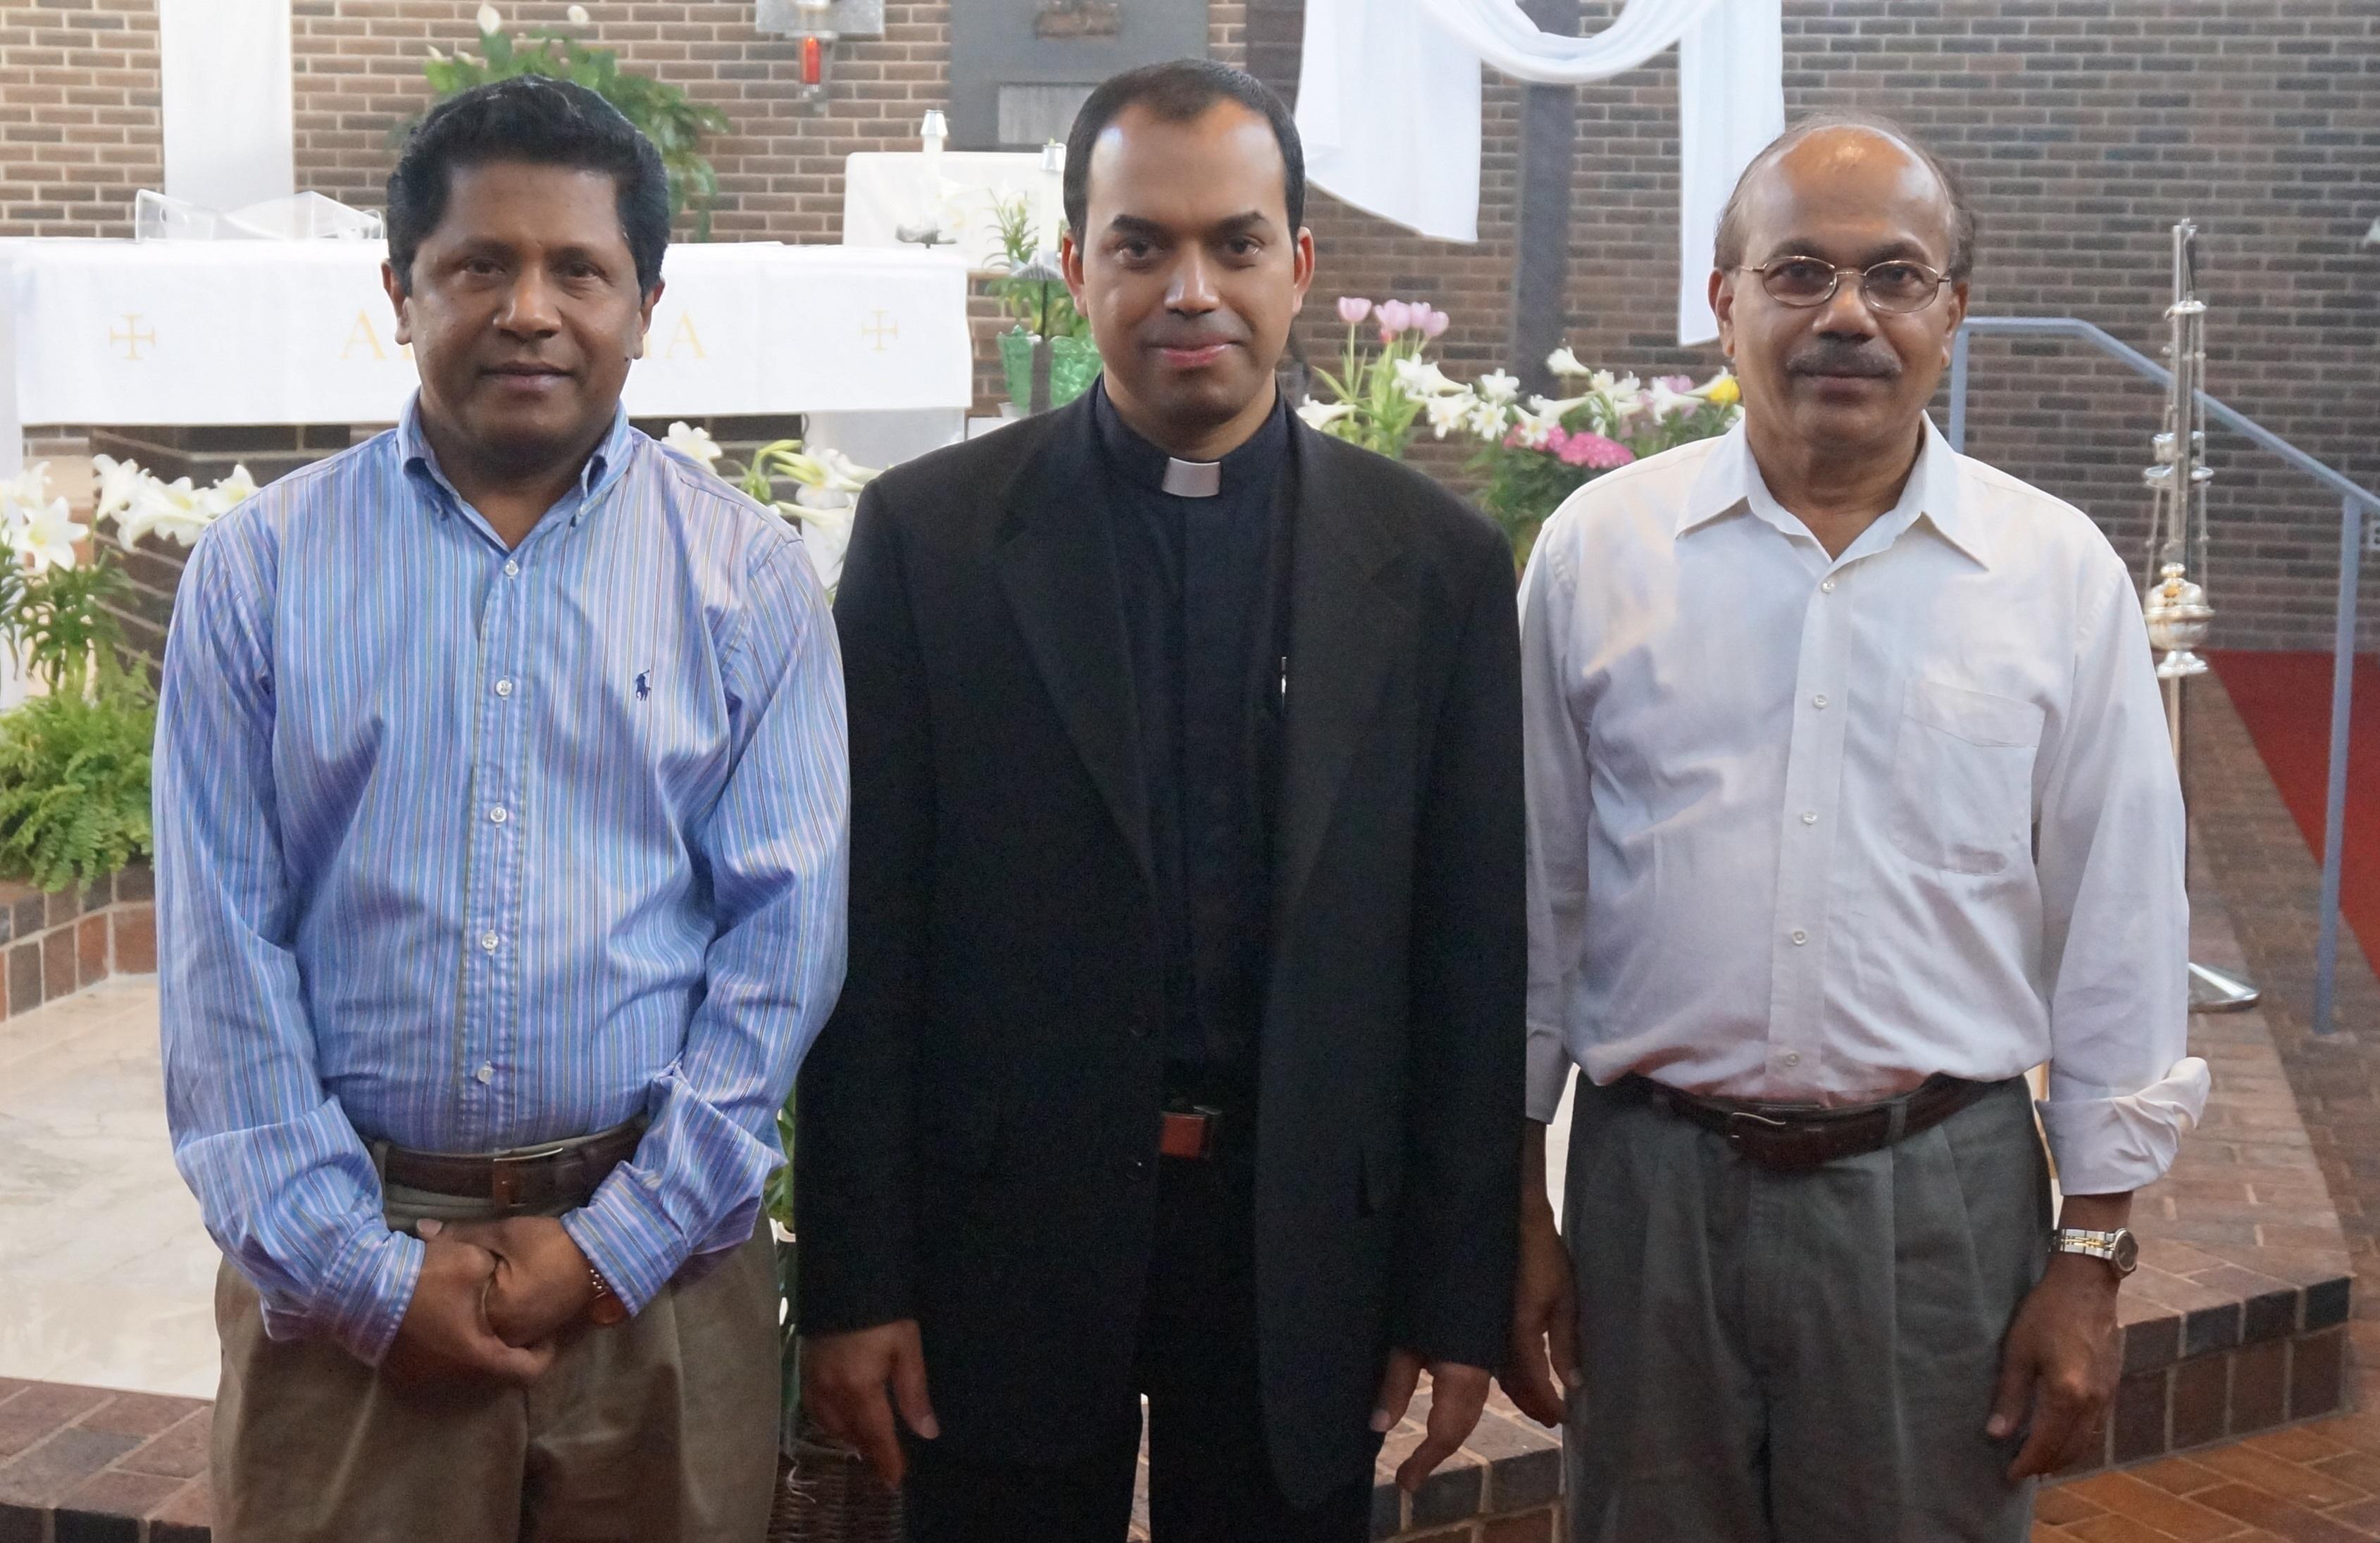 Trustees 2012-2014 Mr. Thomas Chennadu and Mr. Thomas Mathew with Fr. Joseph Pullikattil